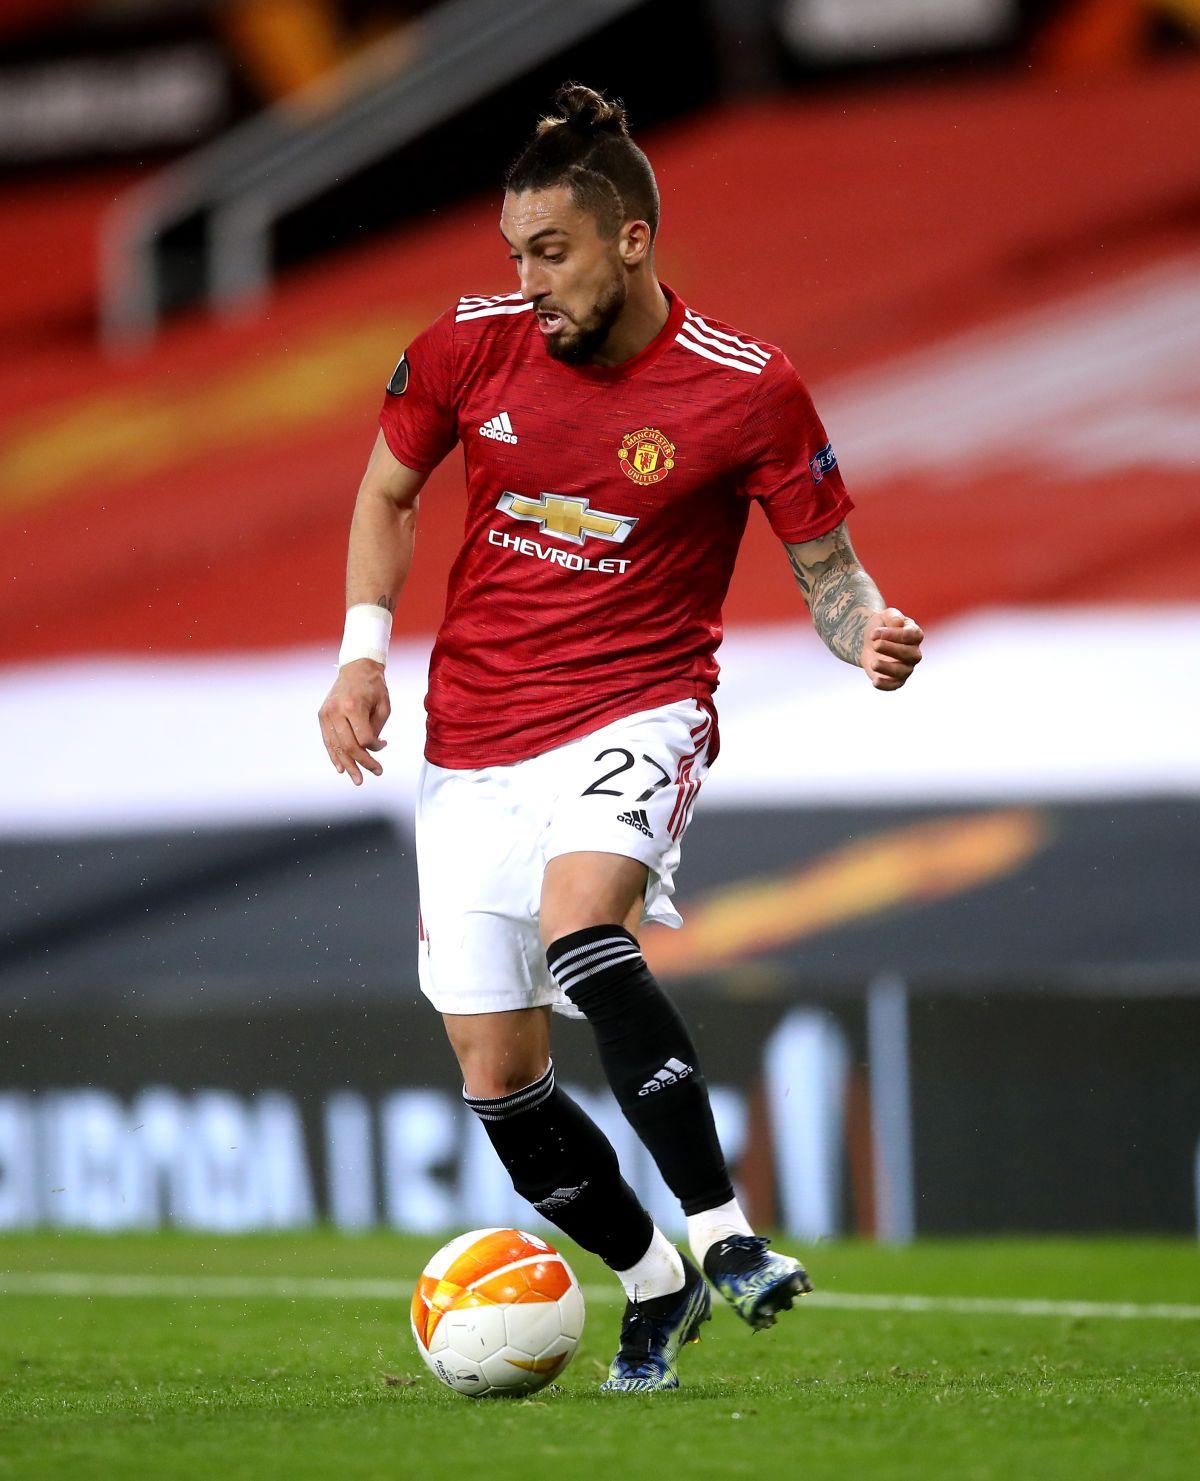 Manchester United defender Alex Telles warns West Ham ahead of cup tie